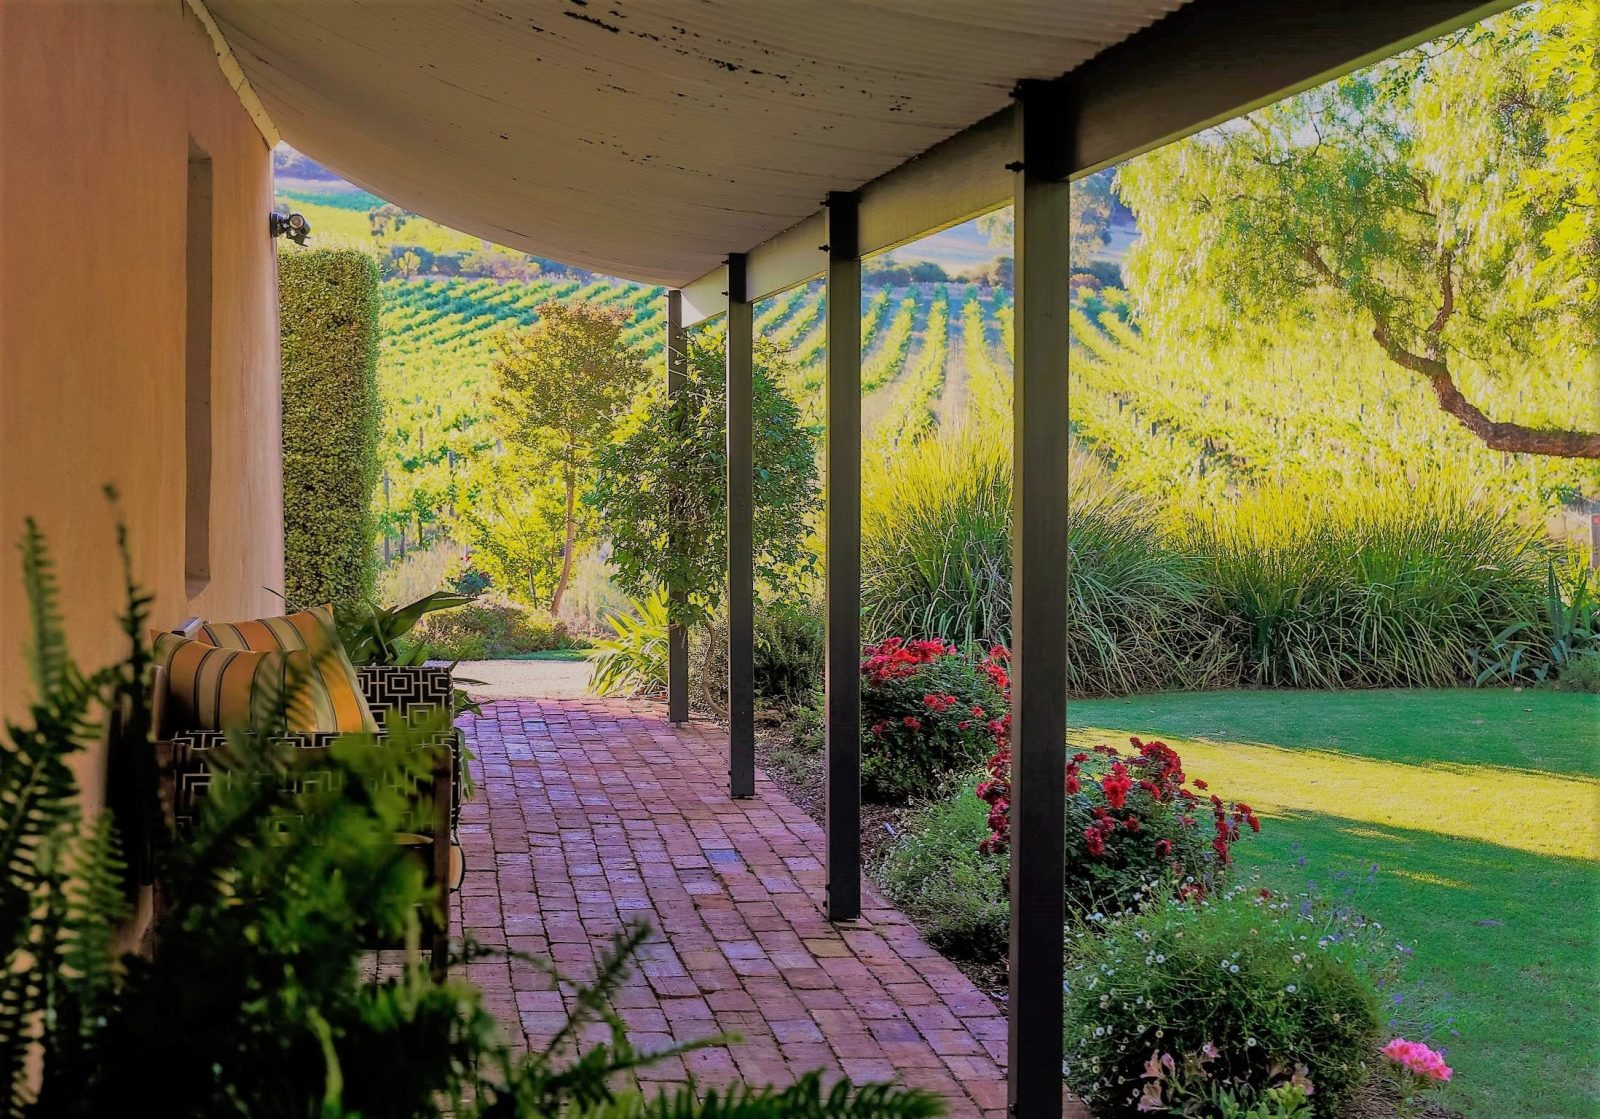 Vineyard views from the front verandah of Seppeltsfield Vineyard Cottage